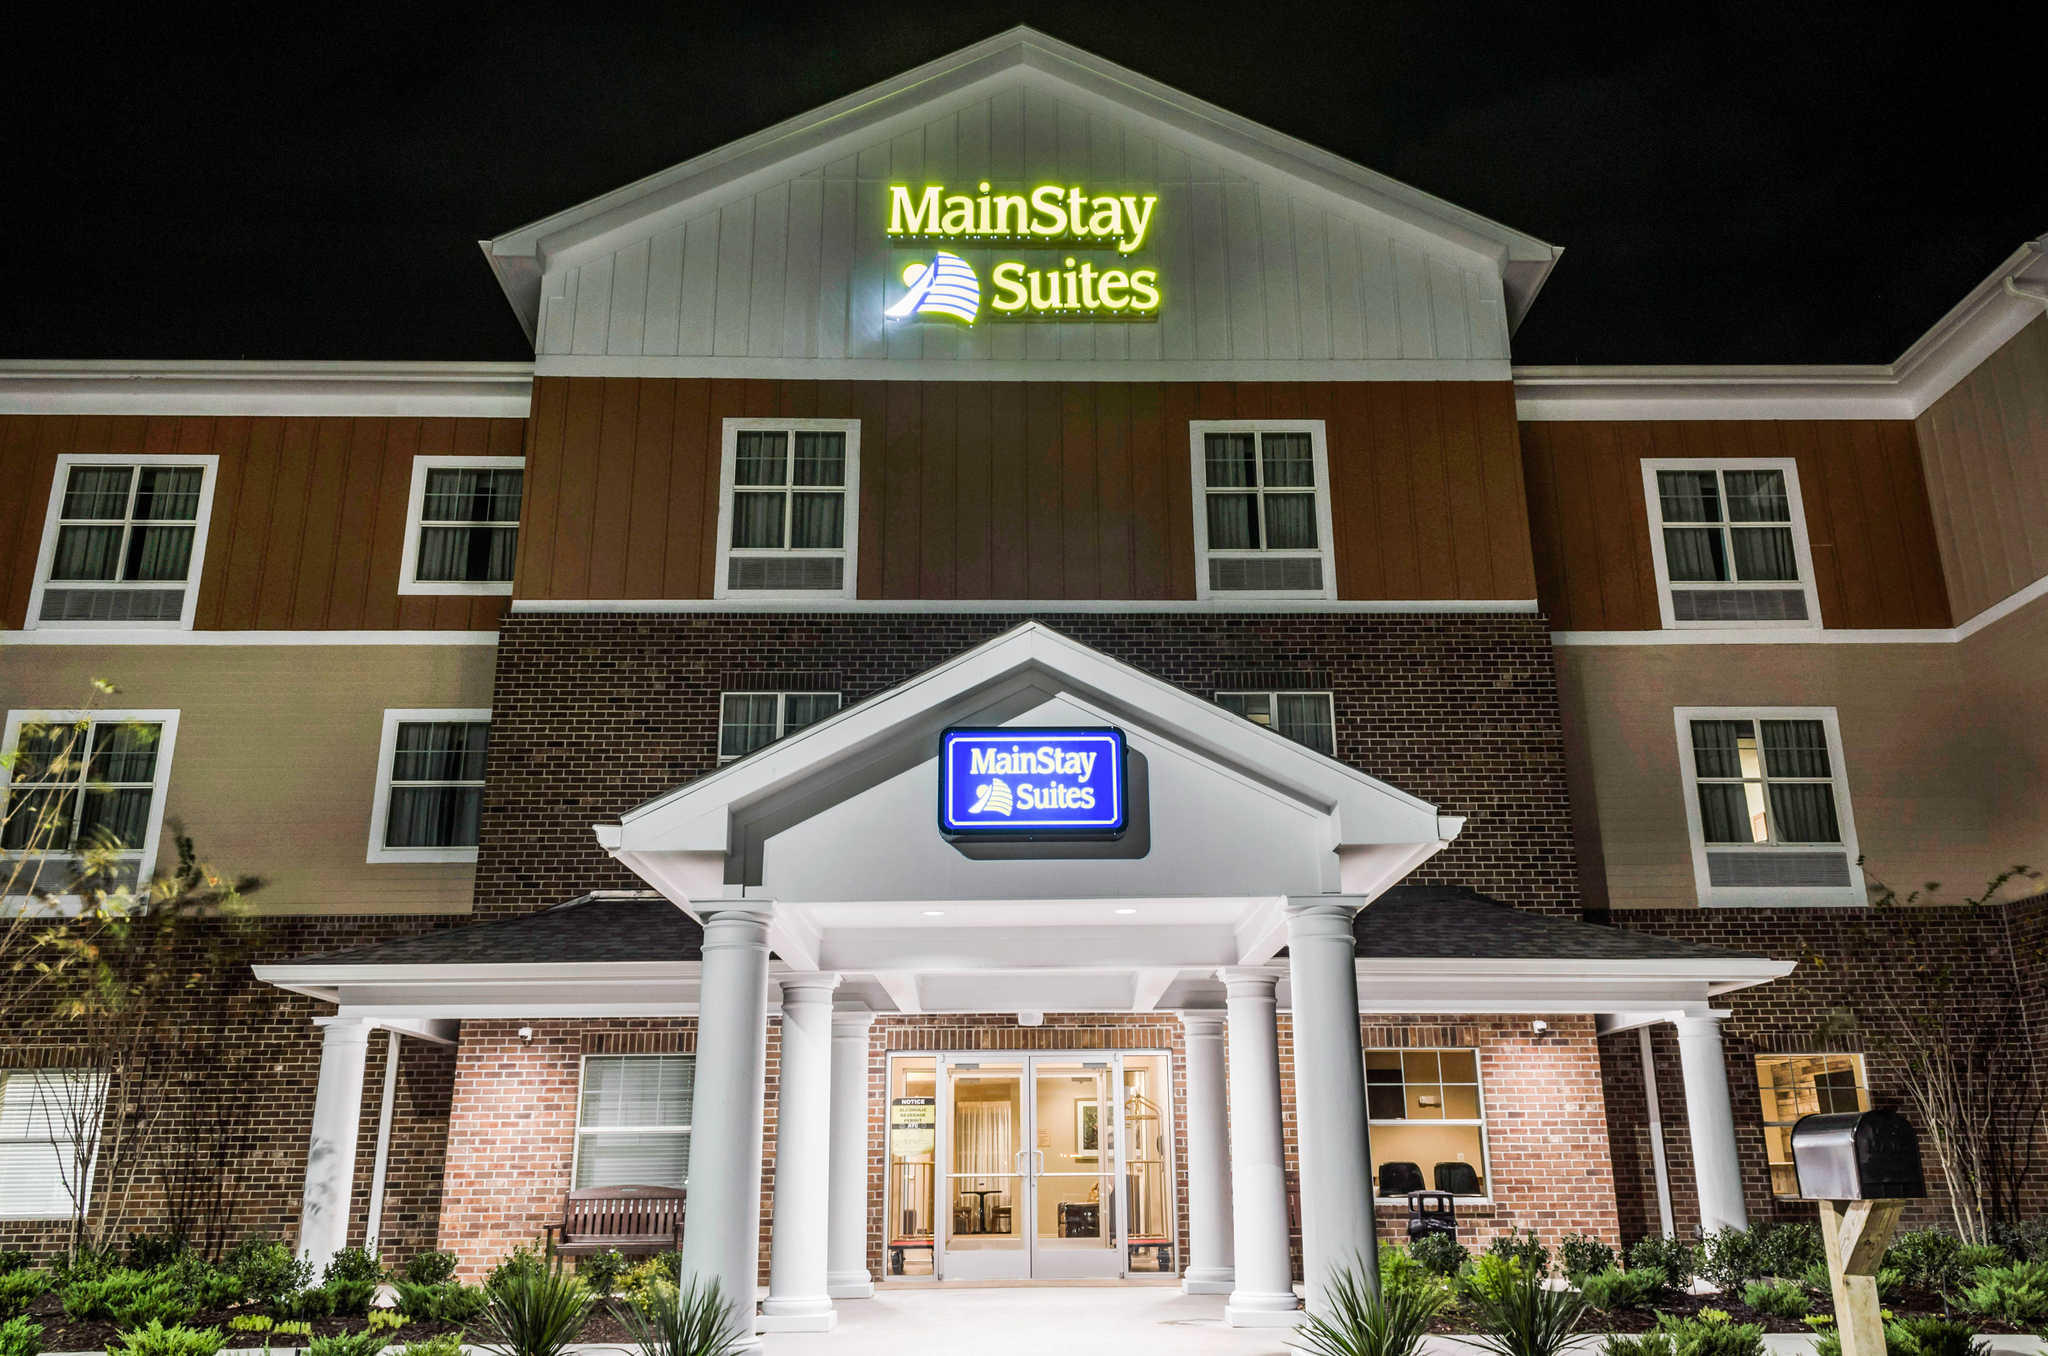 MainStay Suites Hackberry Sportsman's Lodge image 5